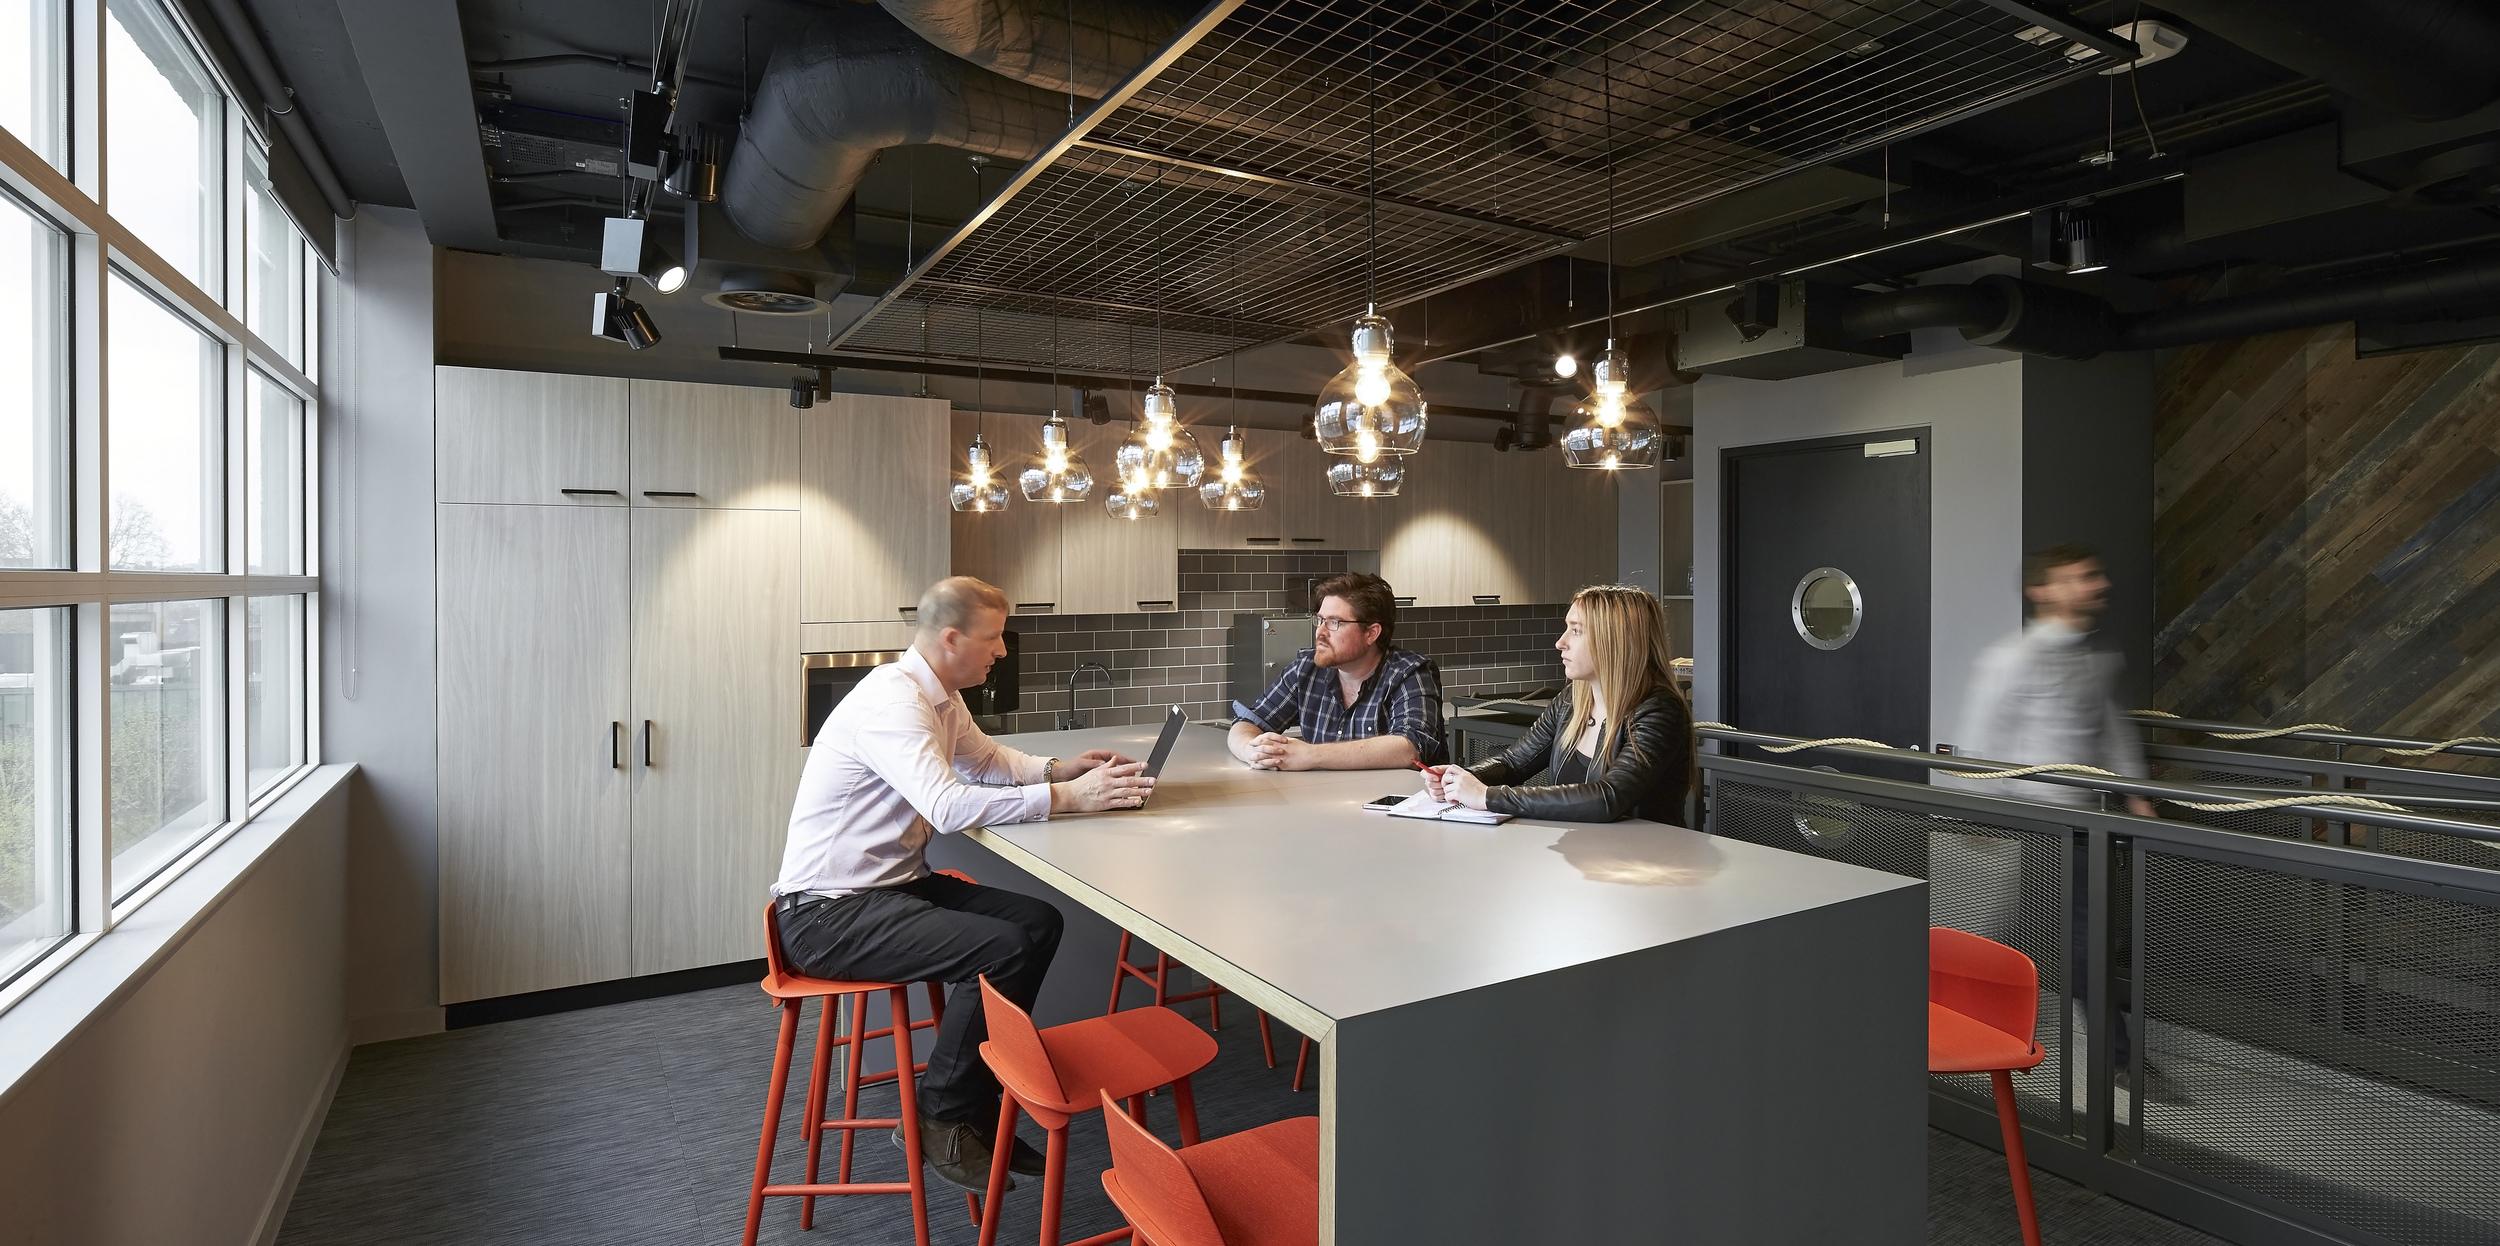 HLW_SKY offices_Brick Lane_-®Hufton+Crow_009.jpg